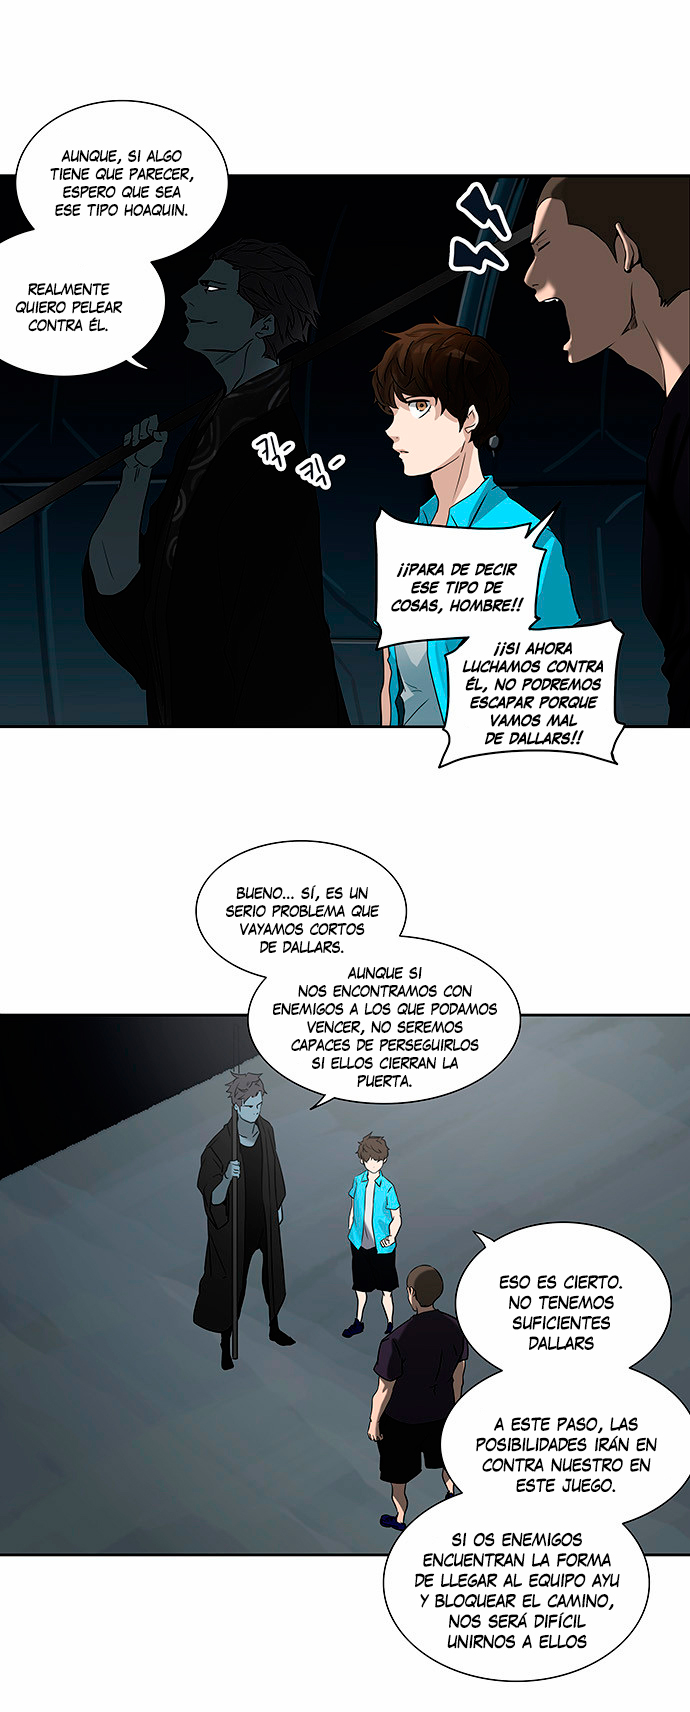 http://c5.ninemanga.com/es_manga/21/149/424362/d922646e87baa7c57a6aa74ab391d517.jpg Page 4